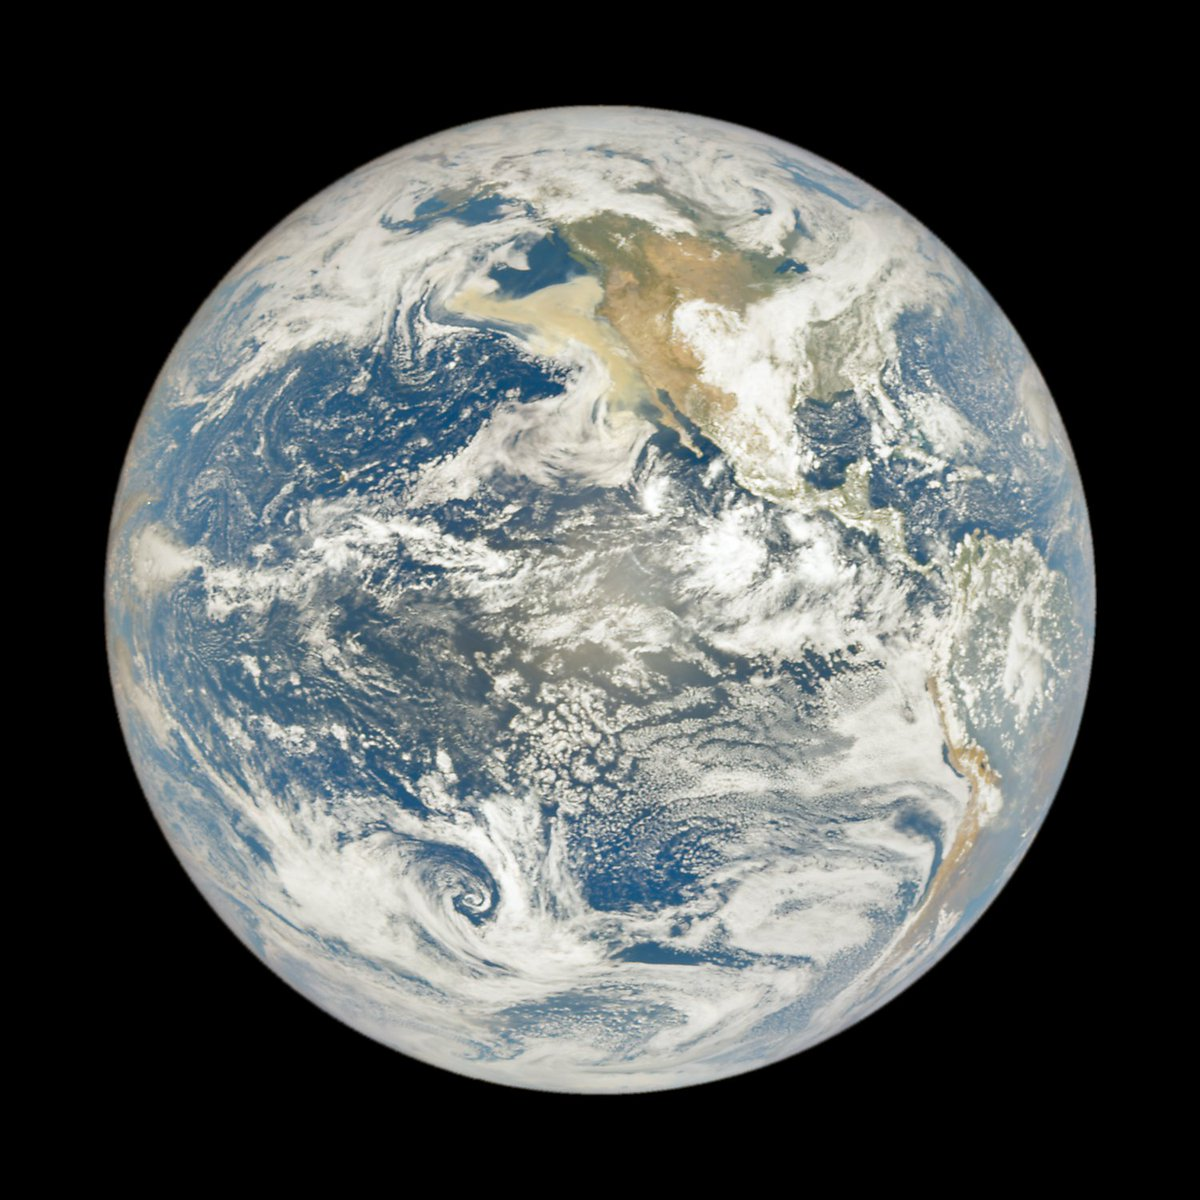 19:52 on Thursday September 10th, over the North Pacific Ocean https://t.co/pc2XvVIDvp